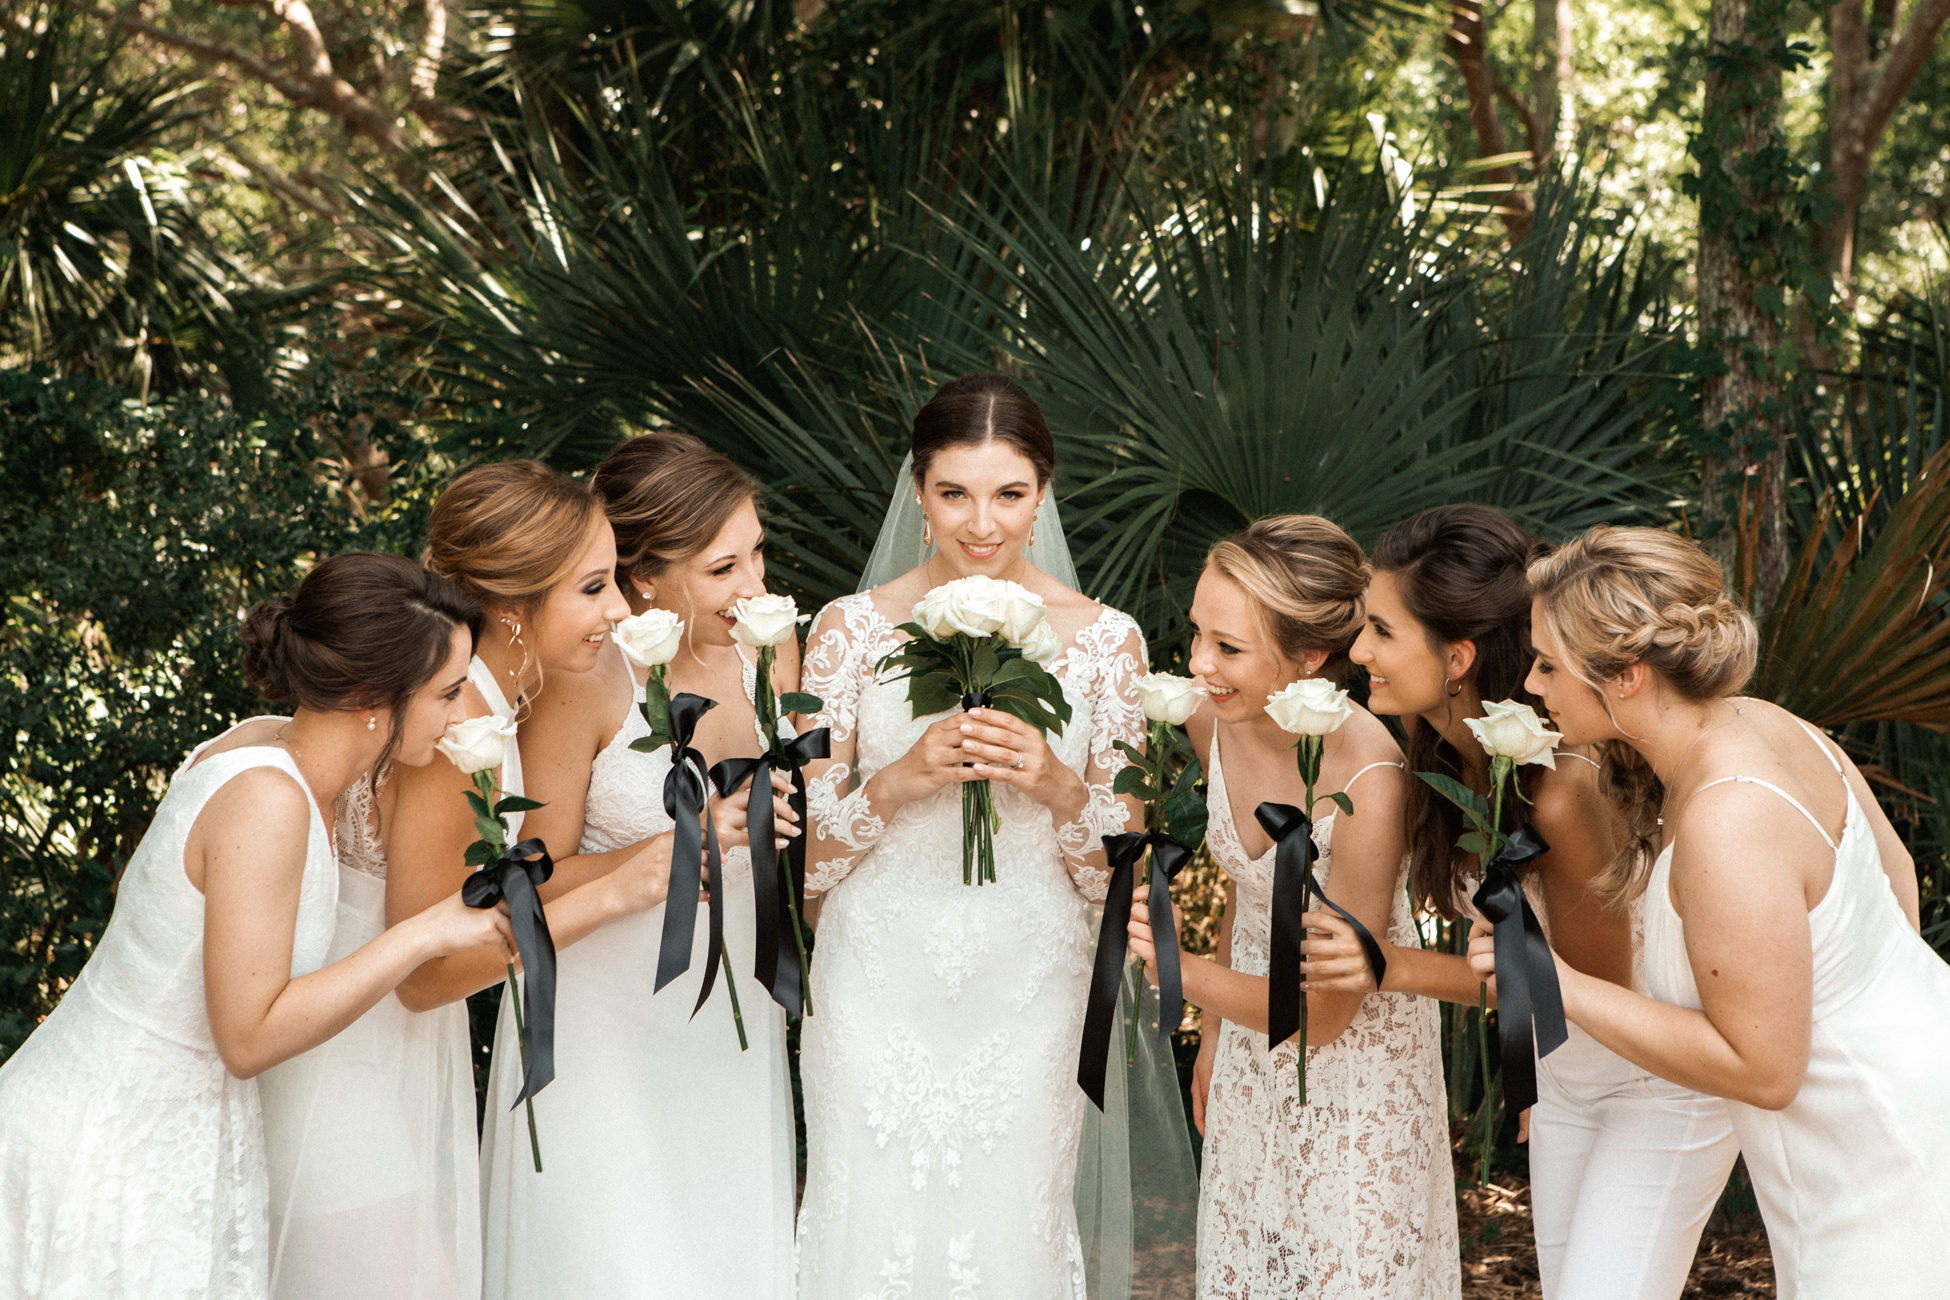 Wedding Day Small-12.jpg